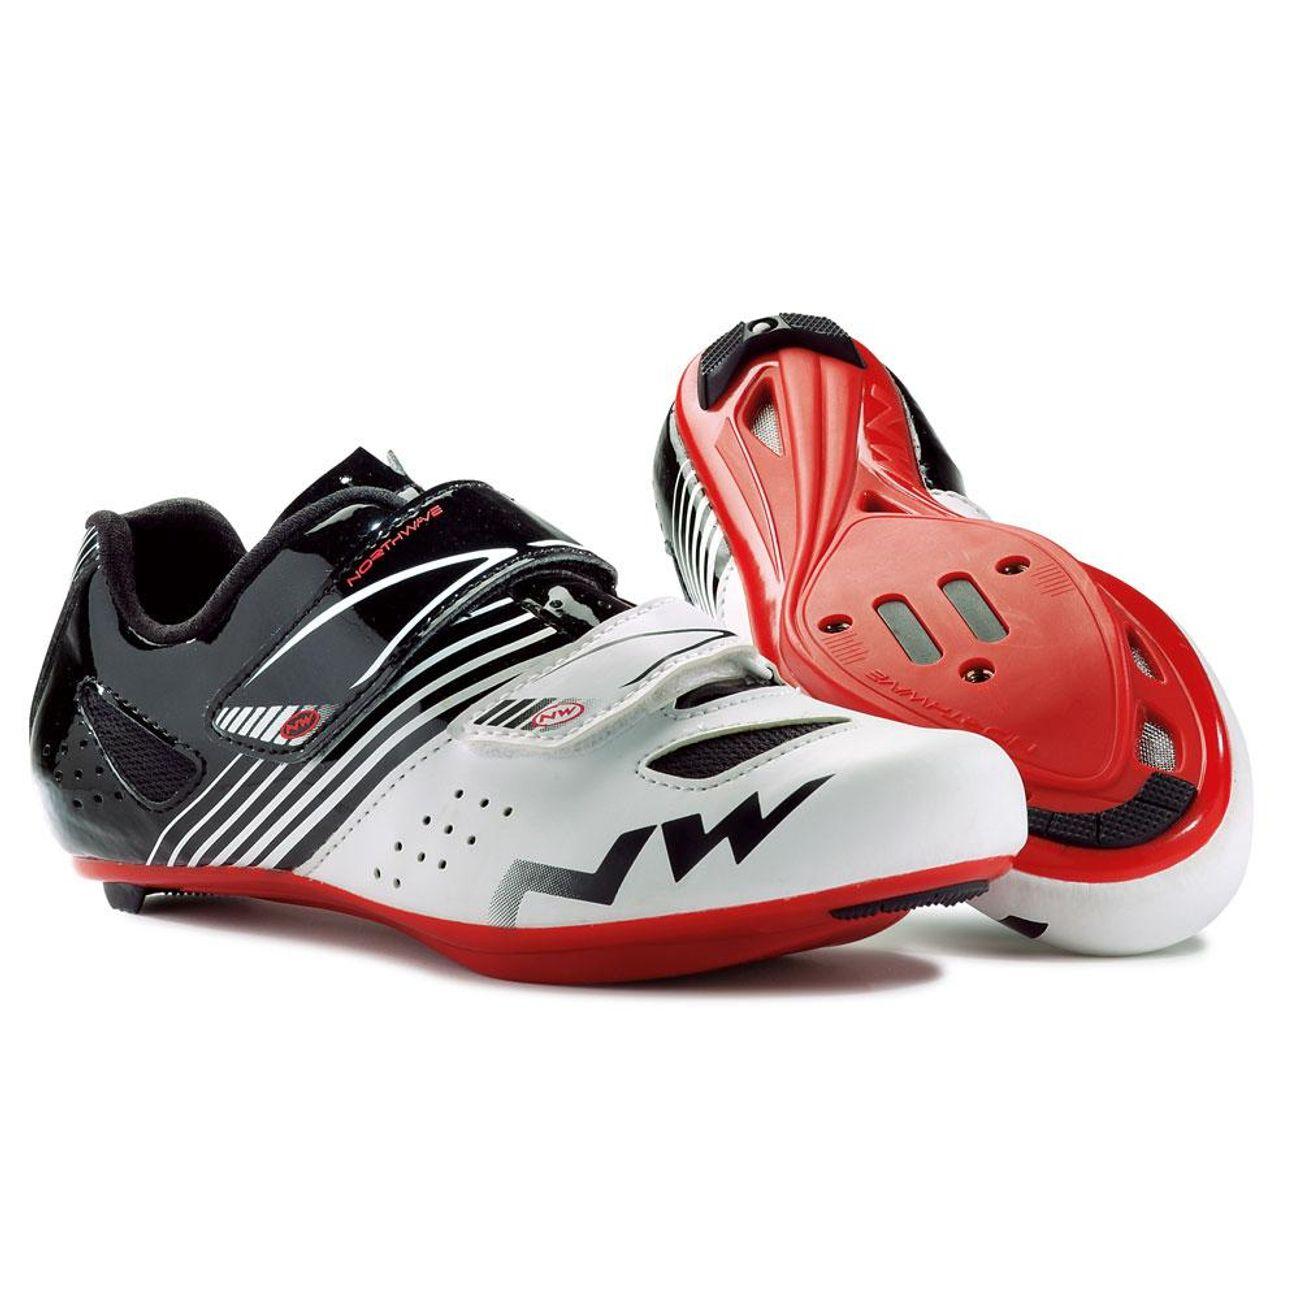 Cyclisme sur route homme NORTHWAVE Chaussures Northwave Torpedo Junior blanc noir rouge